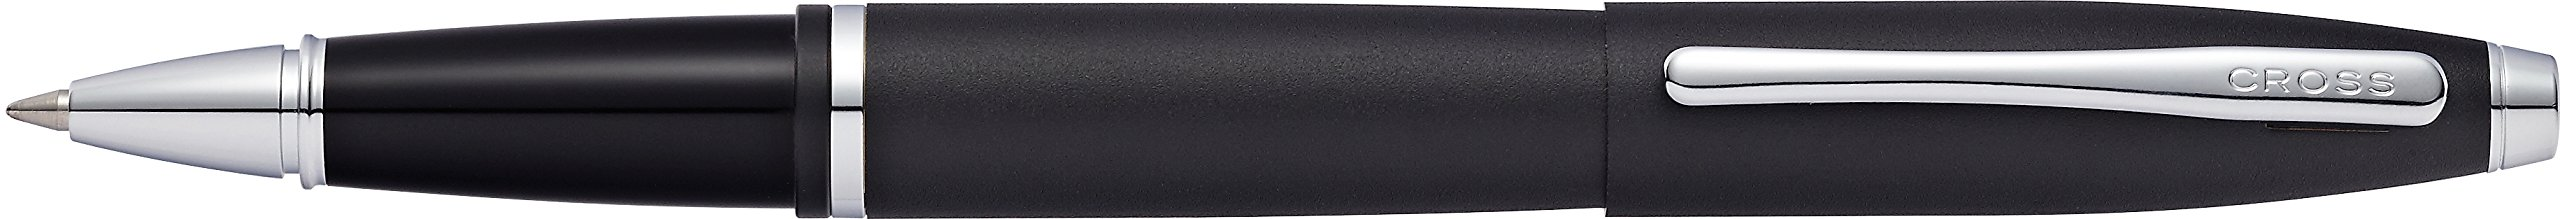 Cross Calais Matte Black Rollerball Pen in Gift Box (AT0115-14)